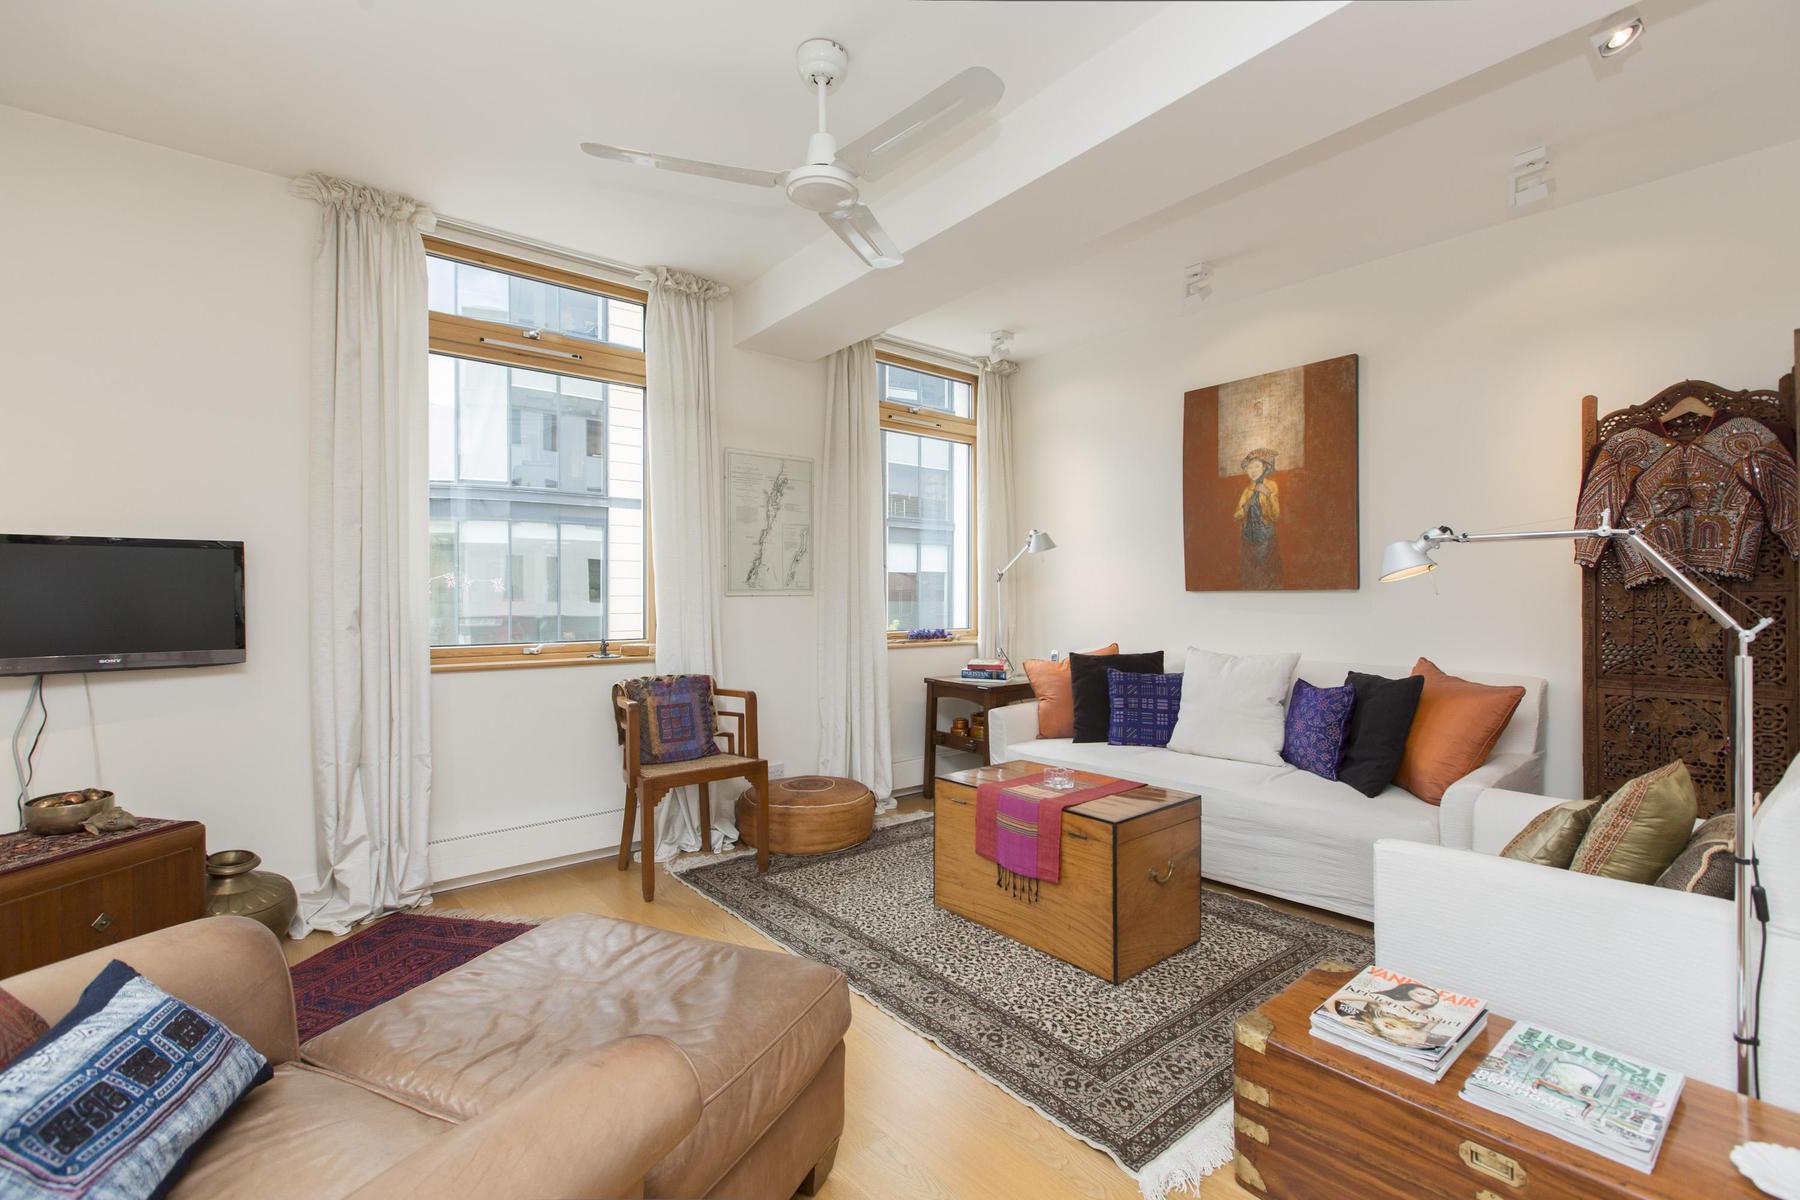 London apartments near waterloo